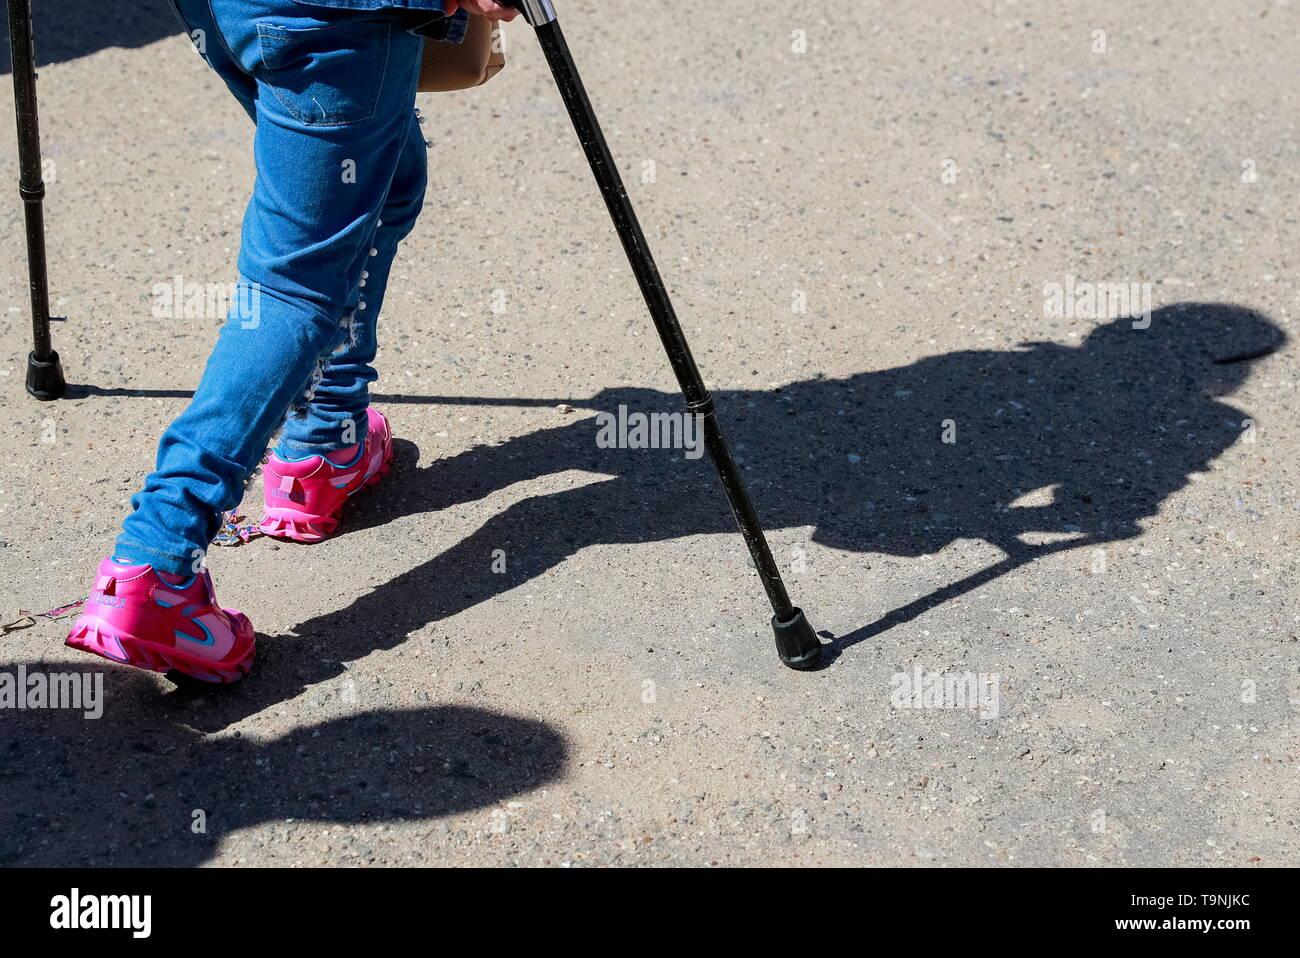 Crutches Child Stock Photos & Crutches Child Stock Images